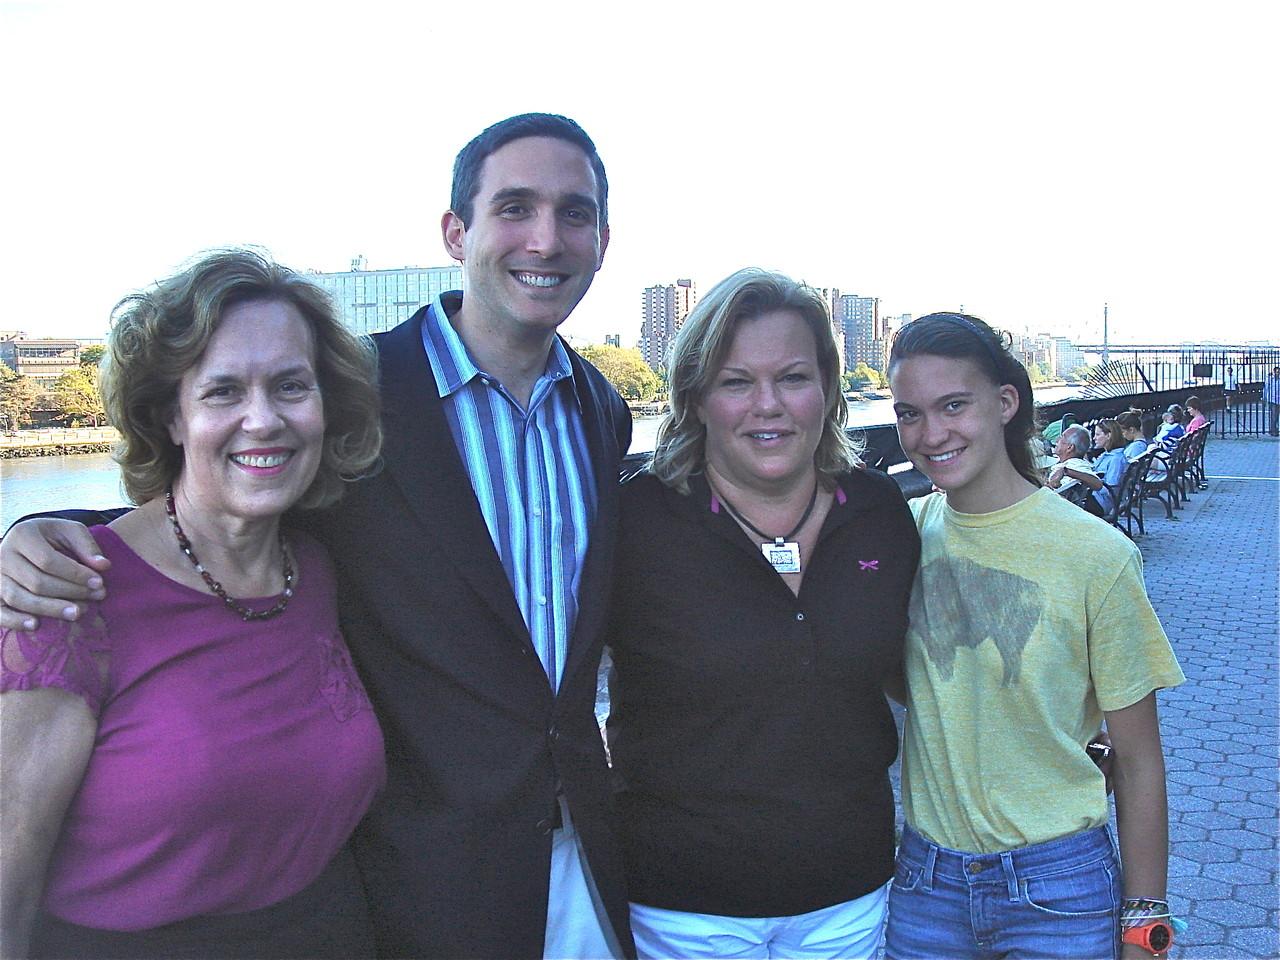 Lorraine, Ben Kallos, Celeste, & Ellie Kagel, Carl Schurz Park, Oct. 2013